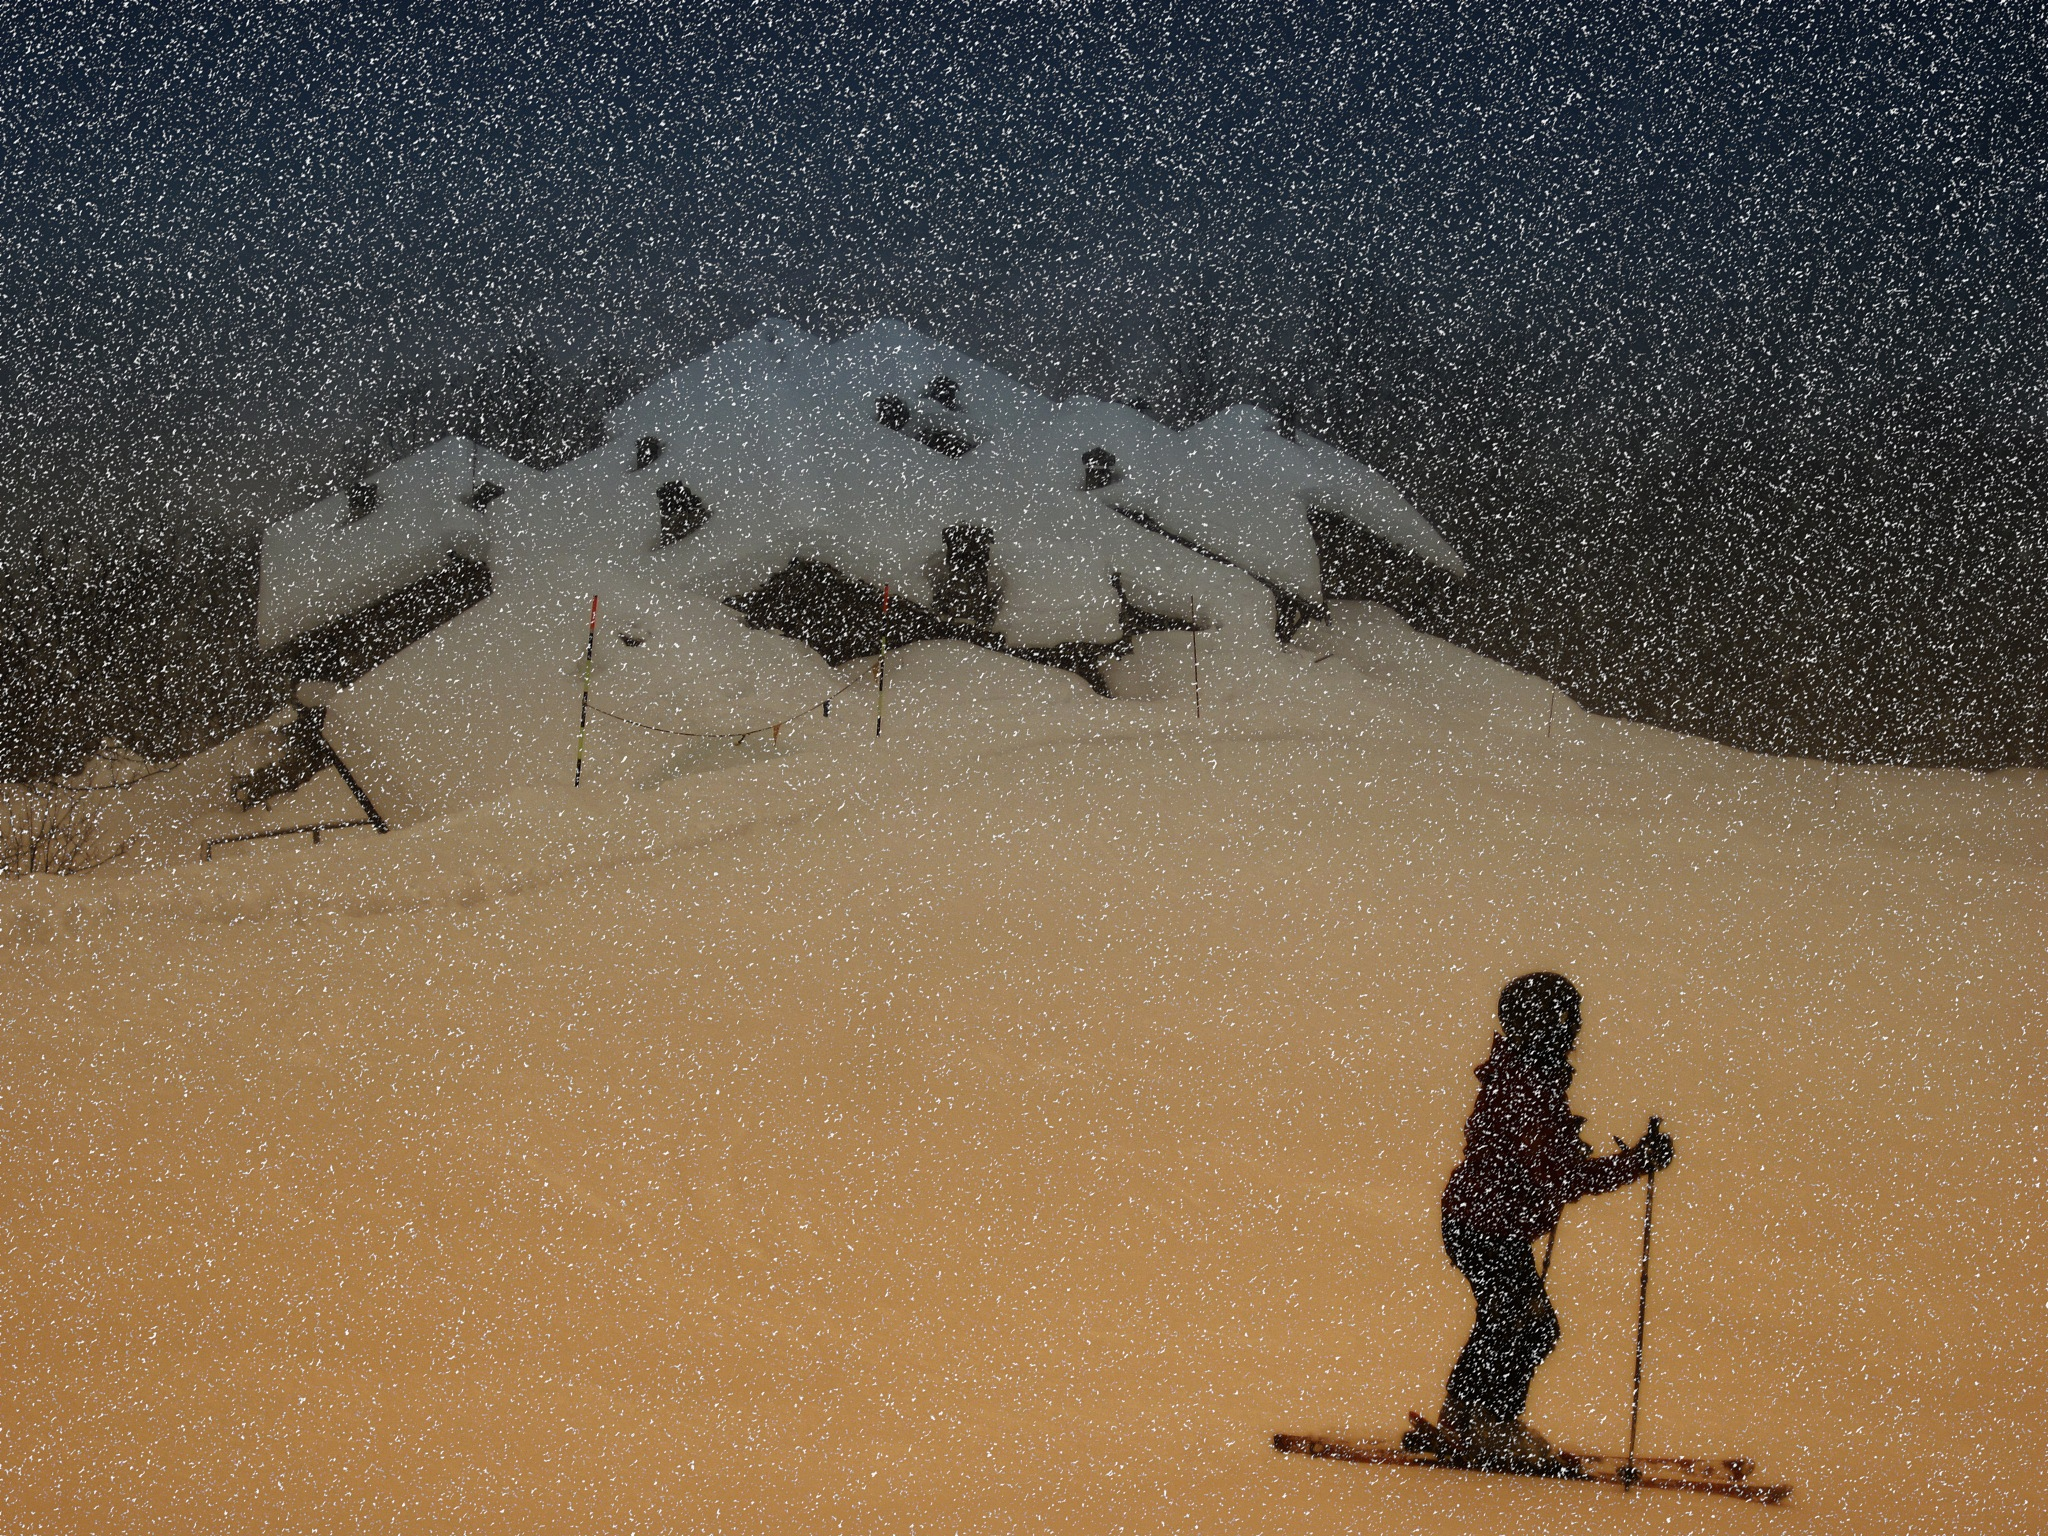 snowfalls by ernesto amato